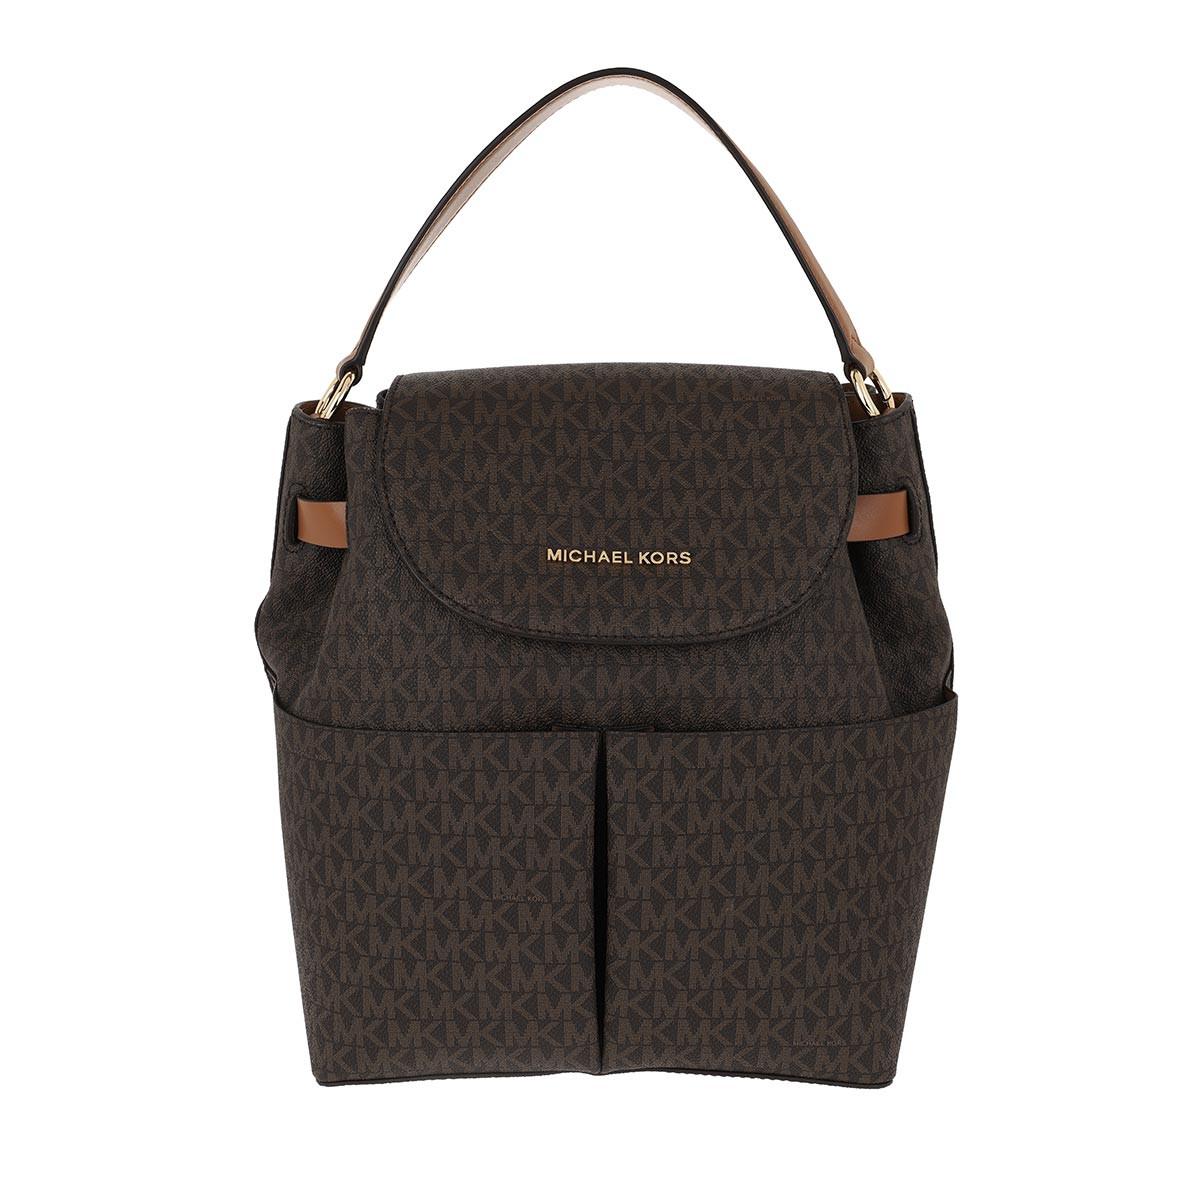 Michael Kors Rucksack - Bedford LG Backpack Brown/Acorn - in braun - für Damen